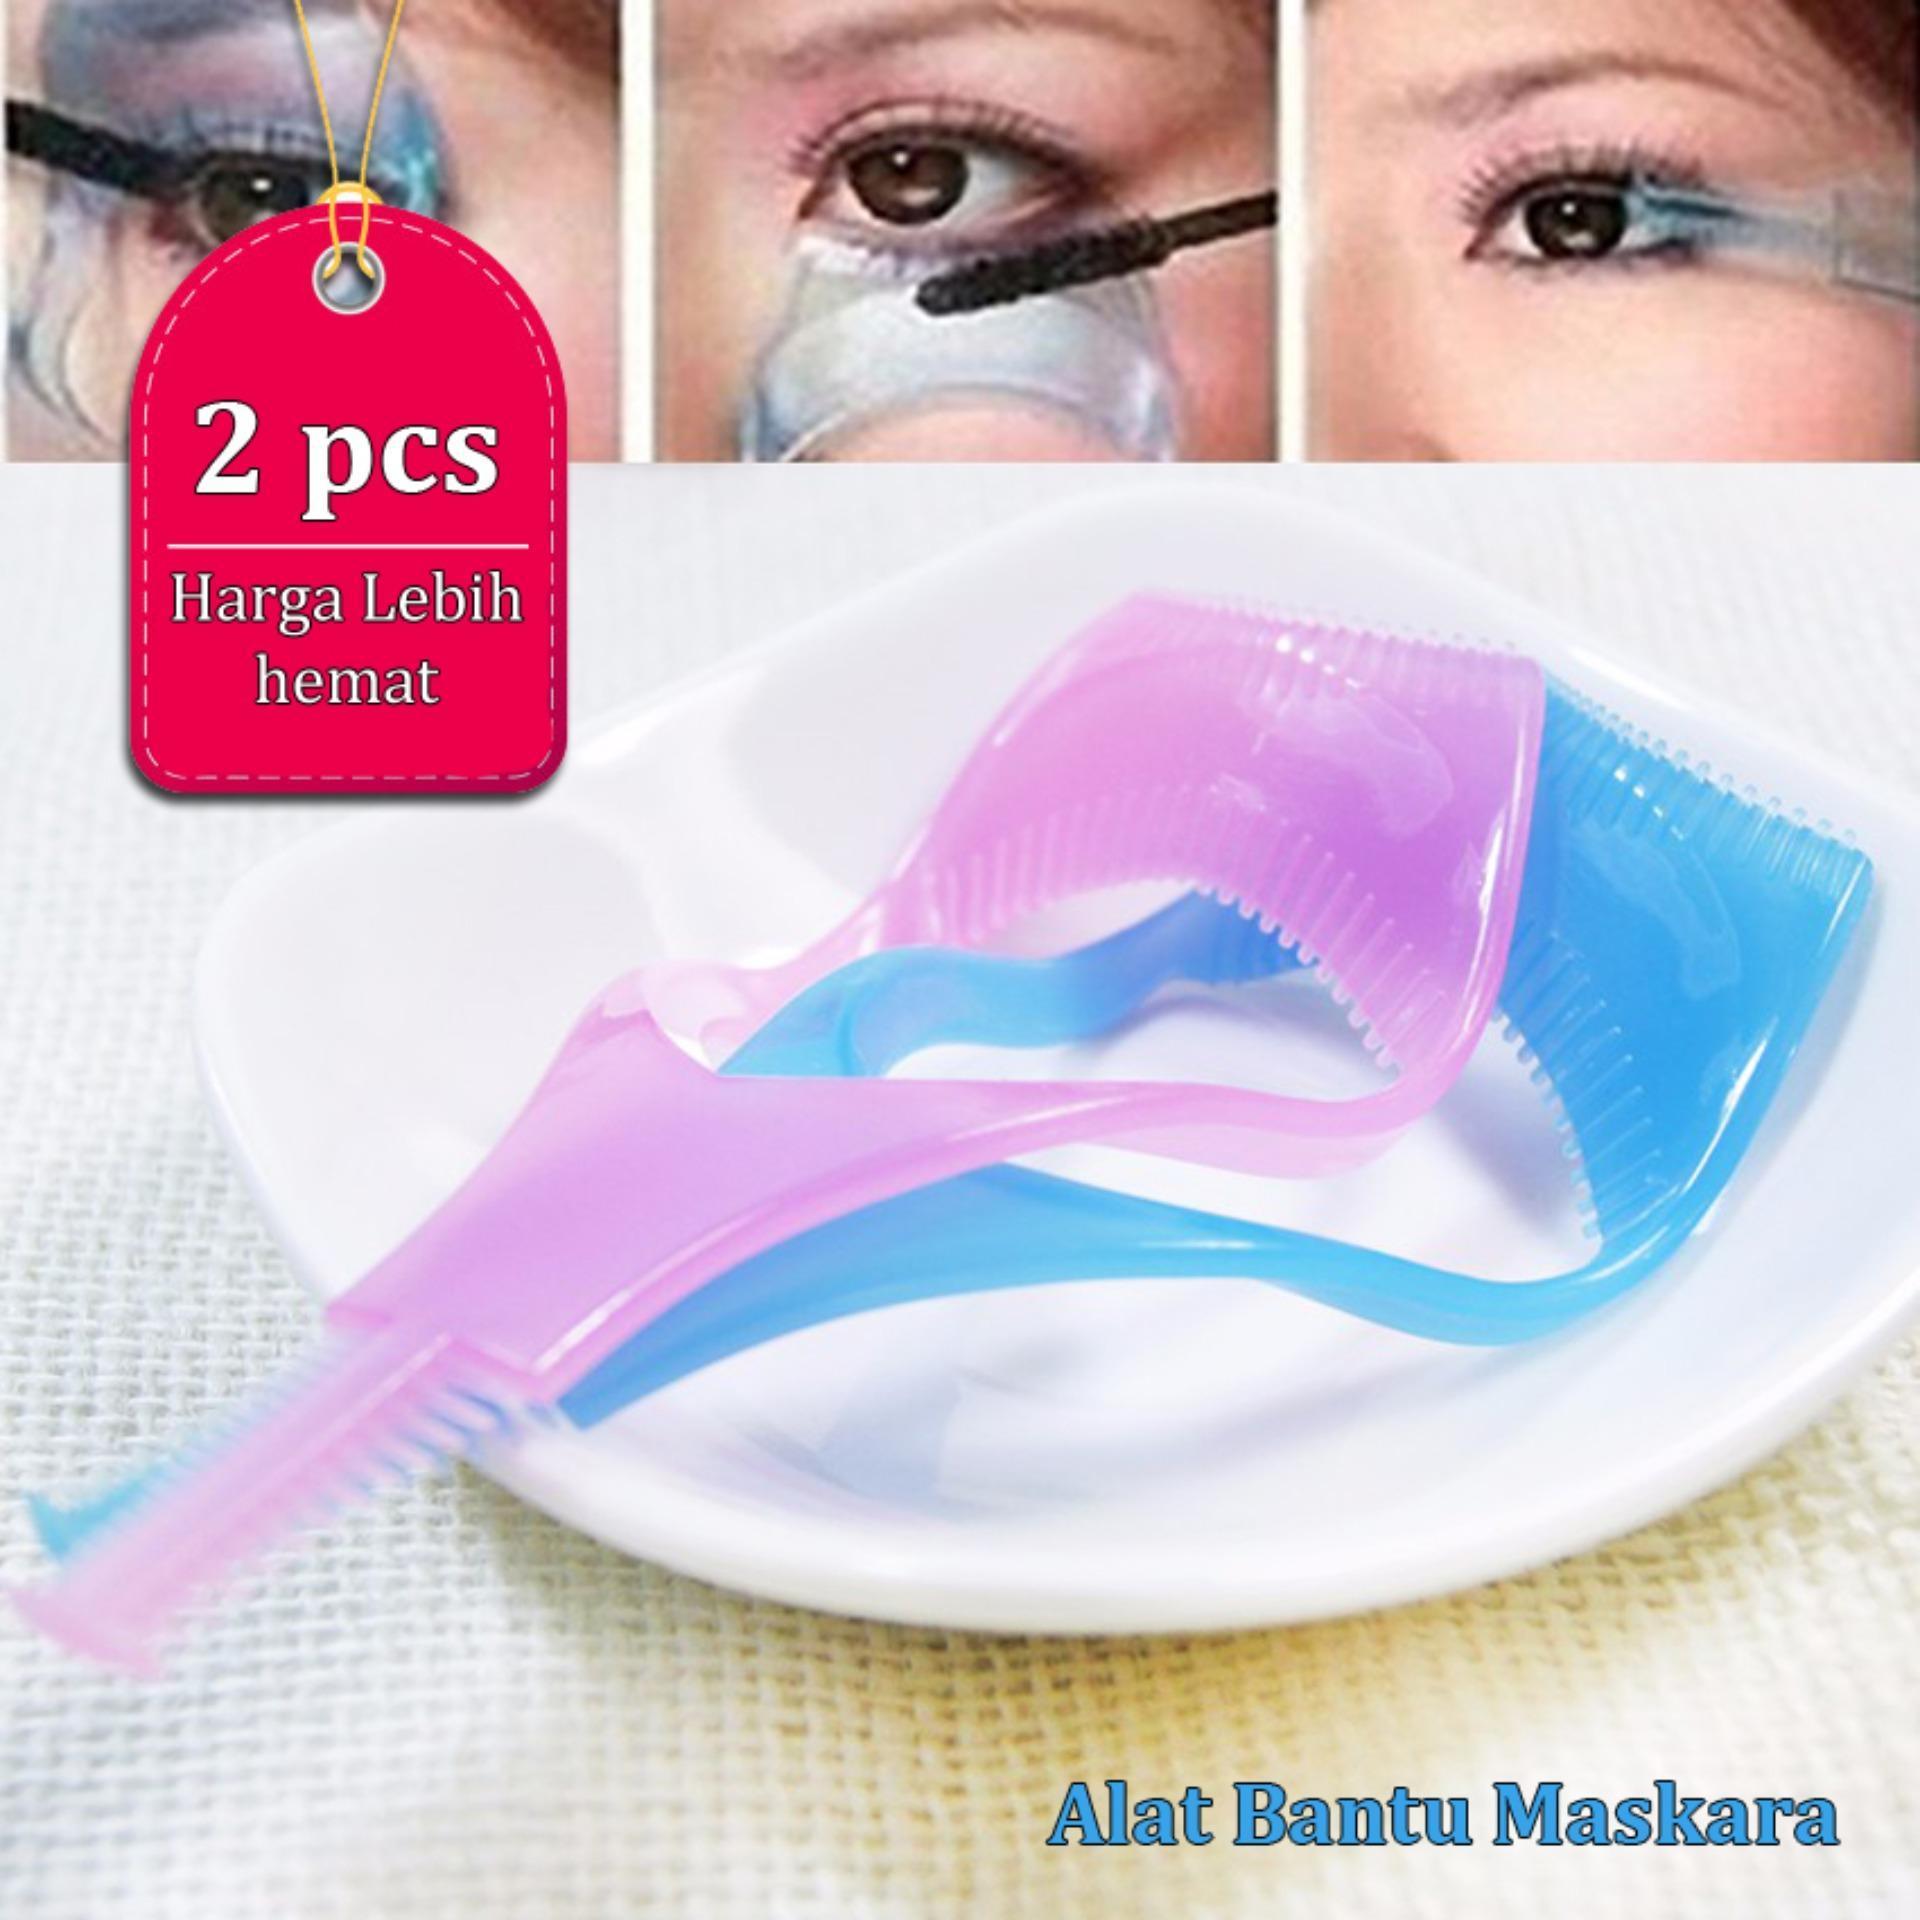 Serba Grosir Murah Alat Bantu Mascara Maskara Make Up For Beauty And Nice Look 1 Set Isi 2